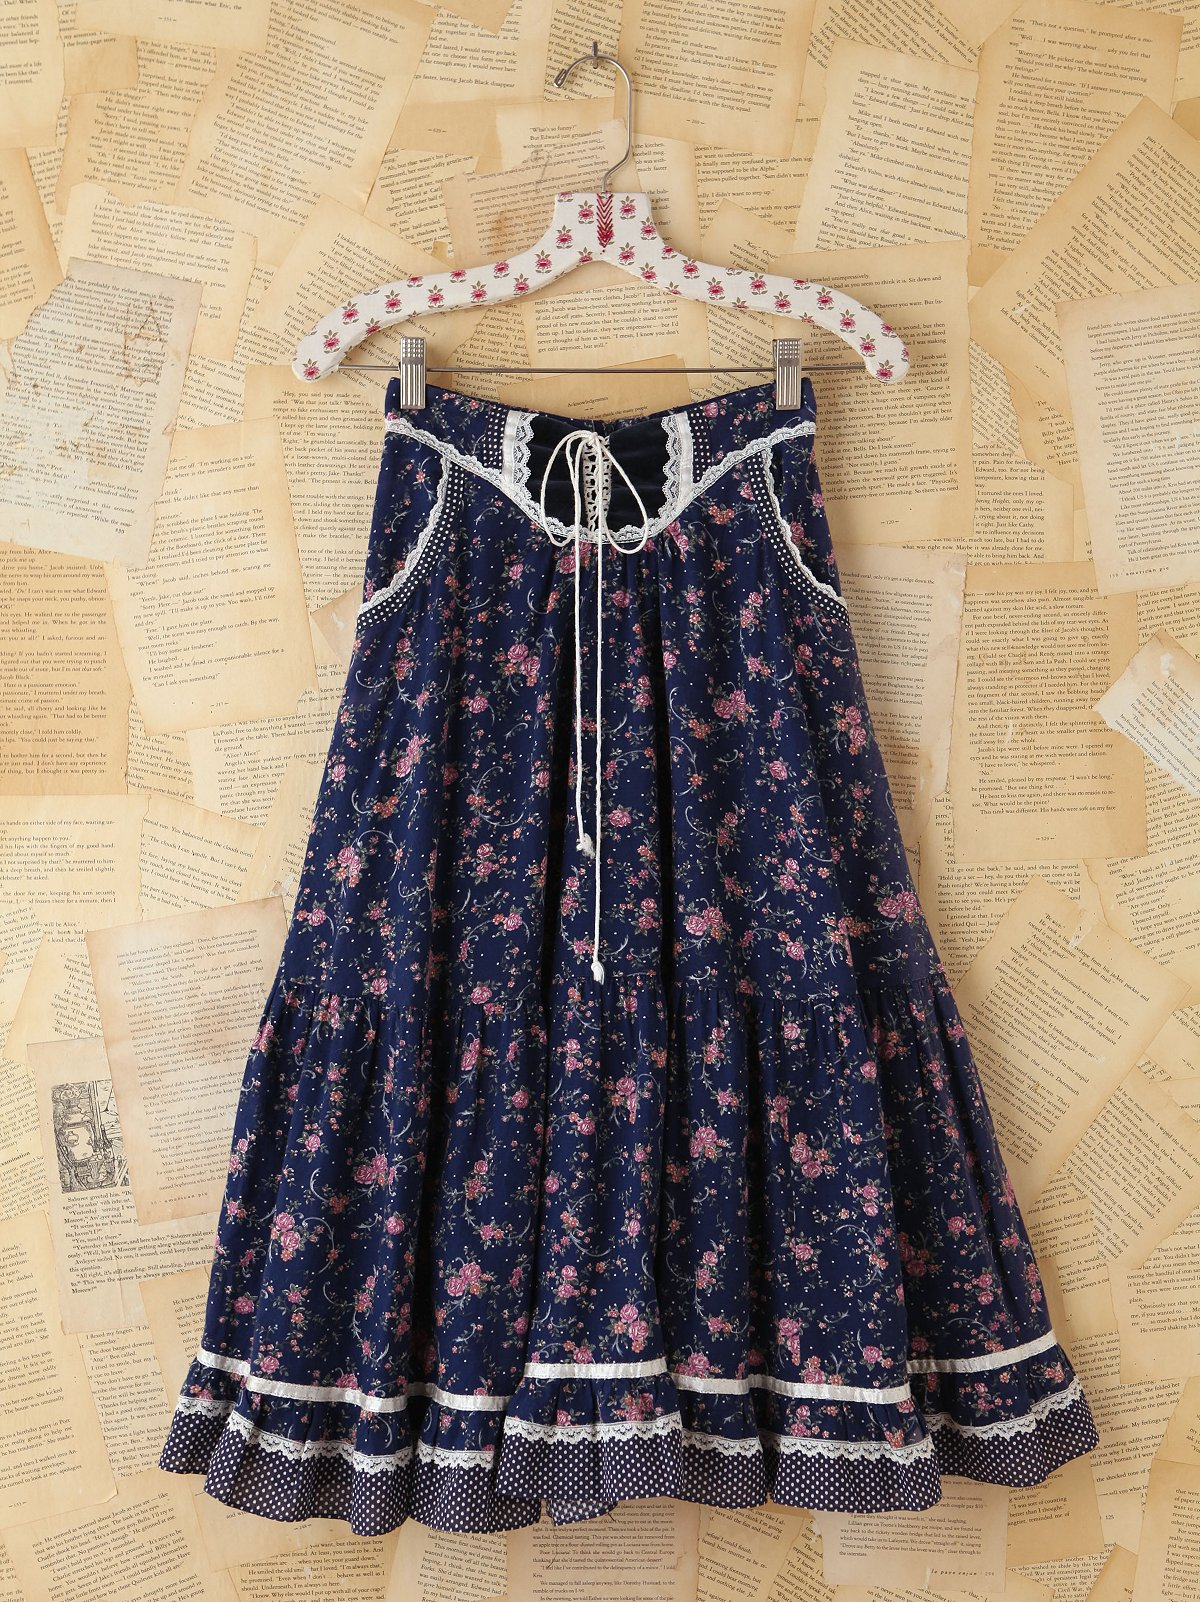 Vintage Floral Lace Skirt